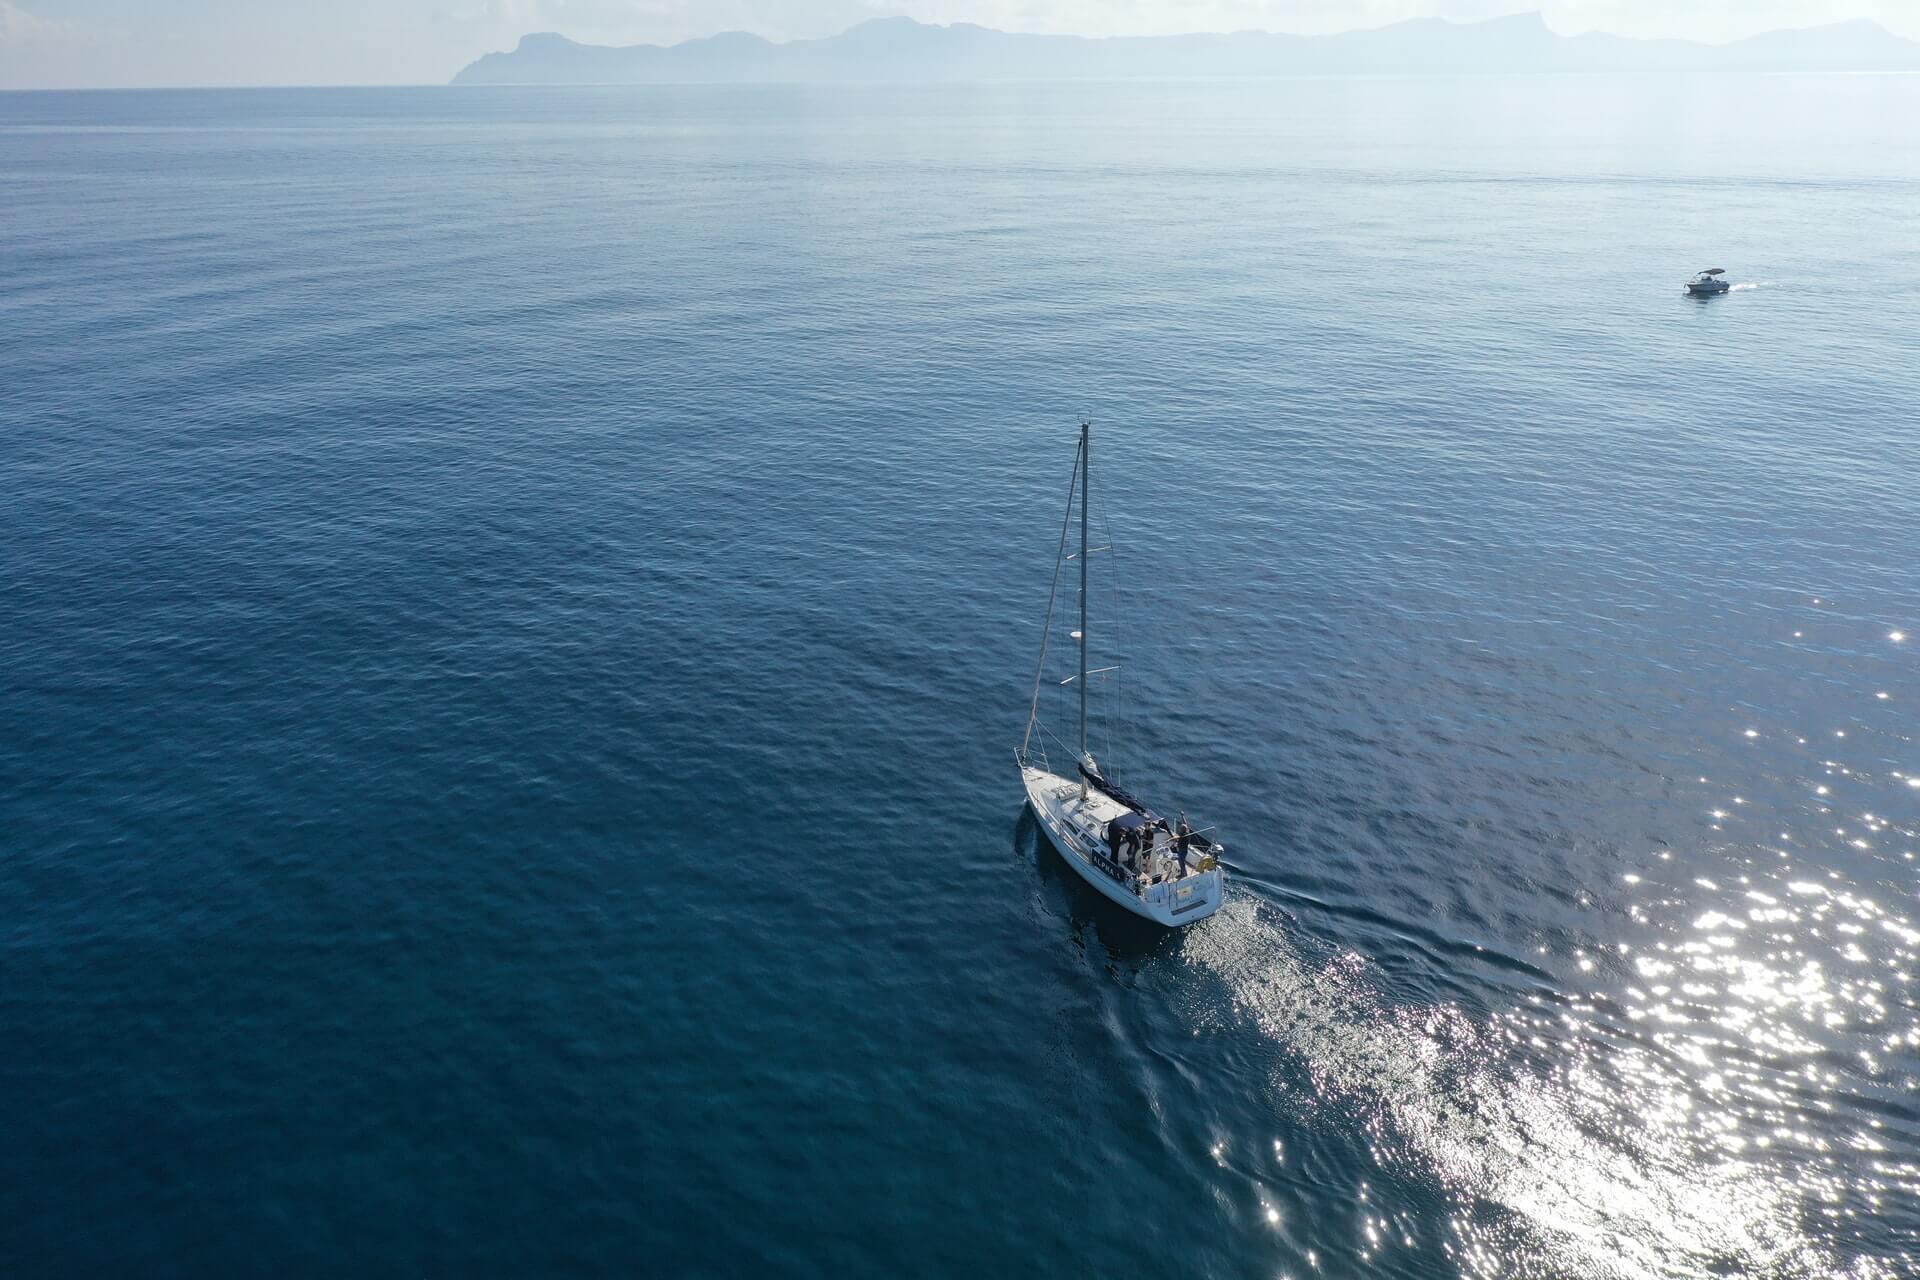 A sailboat crossing an ocean